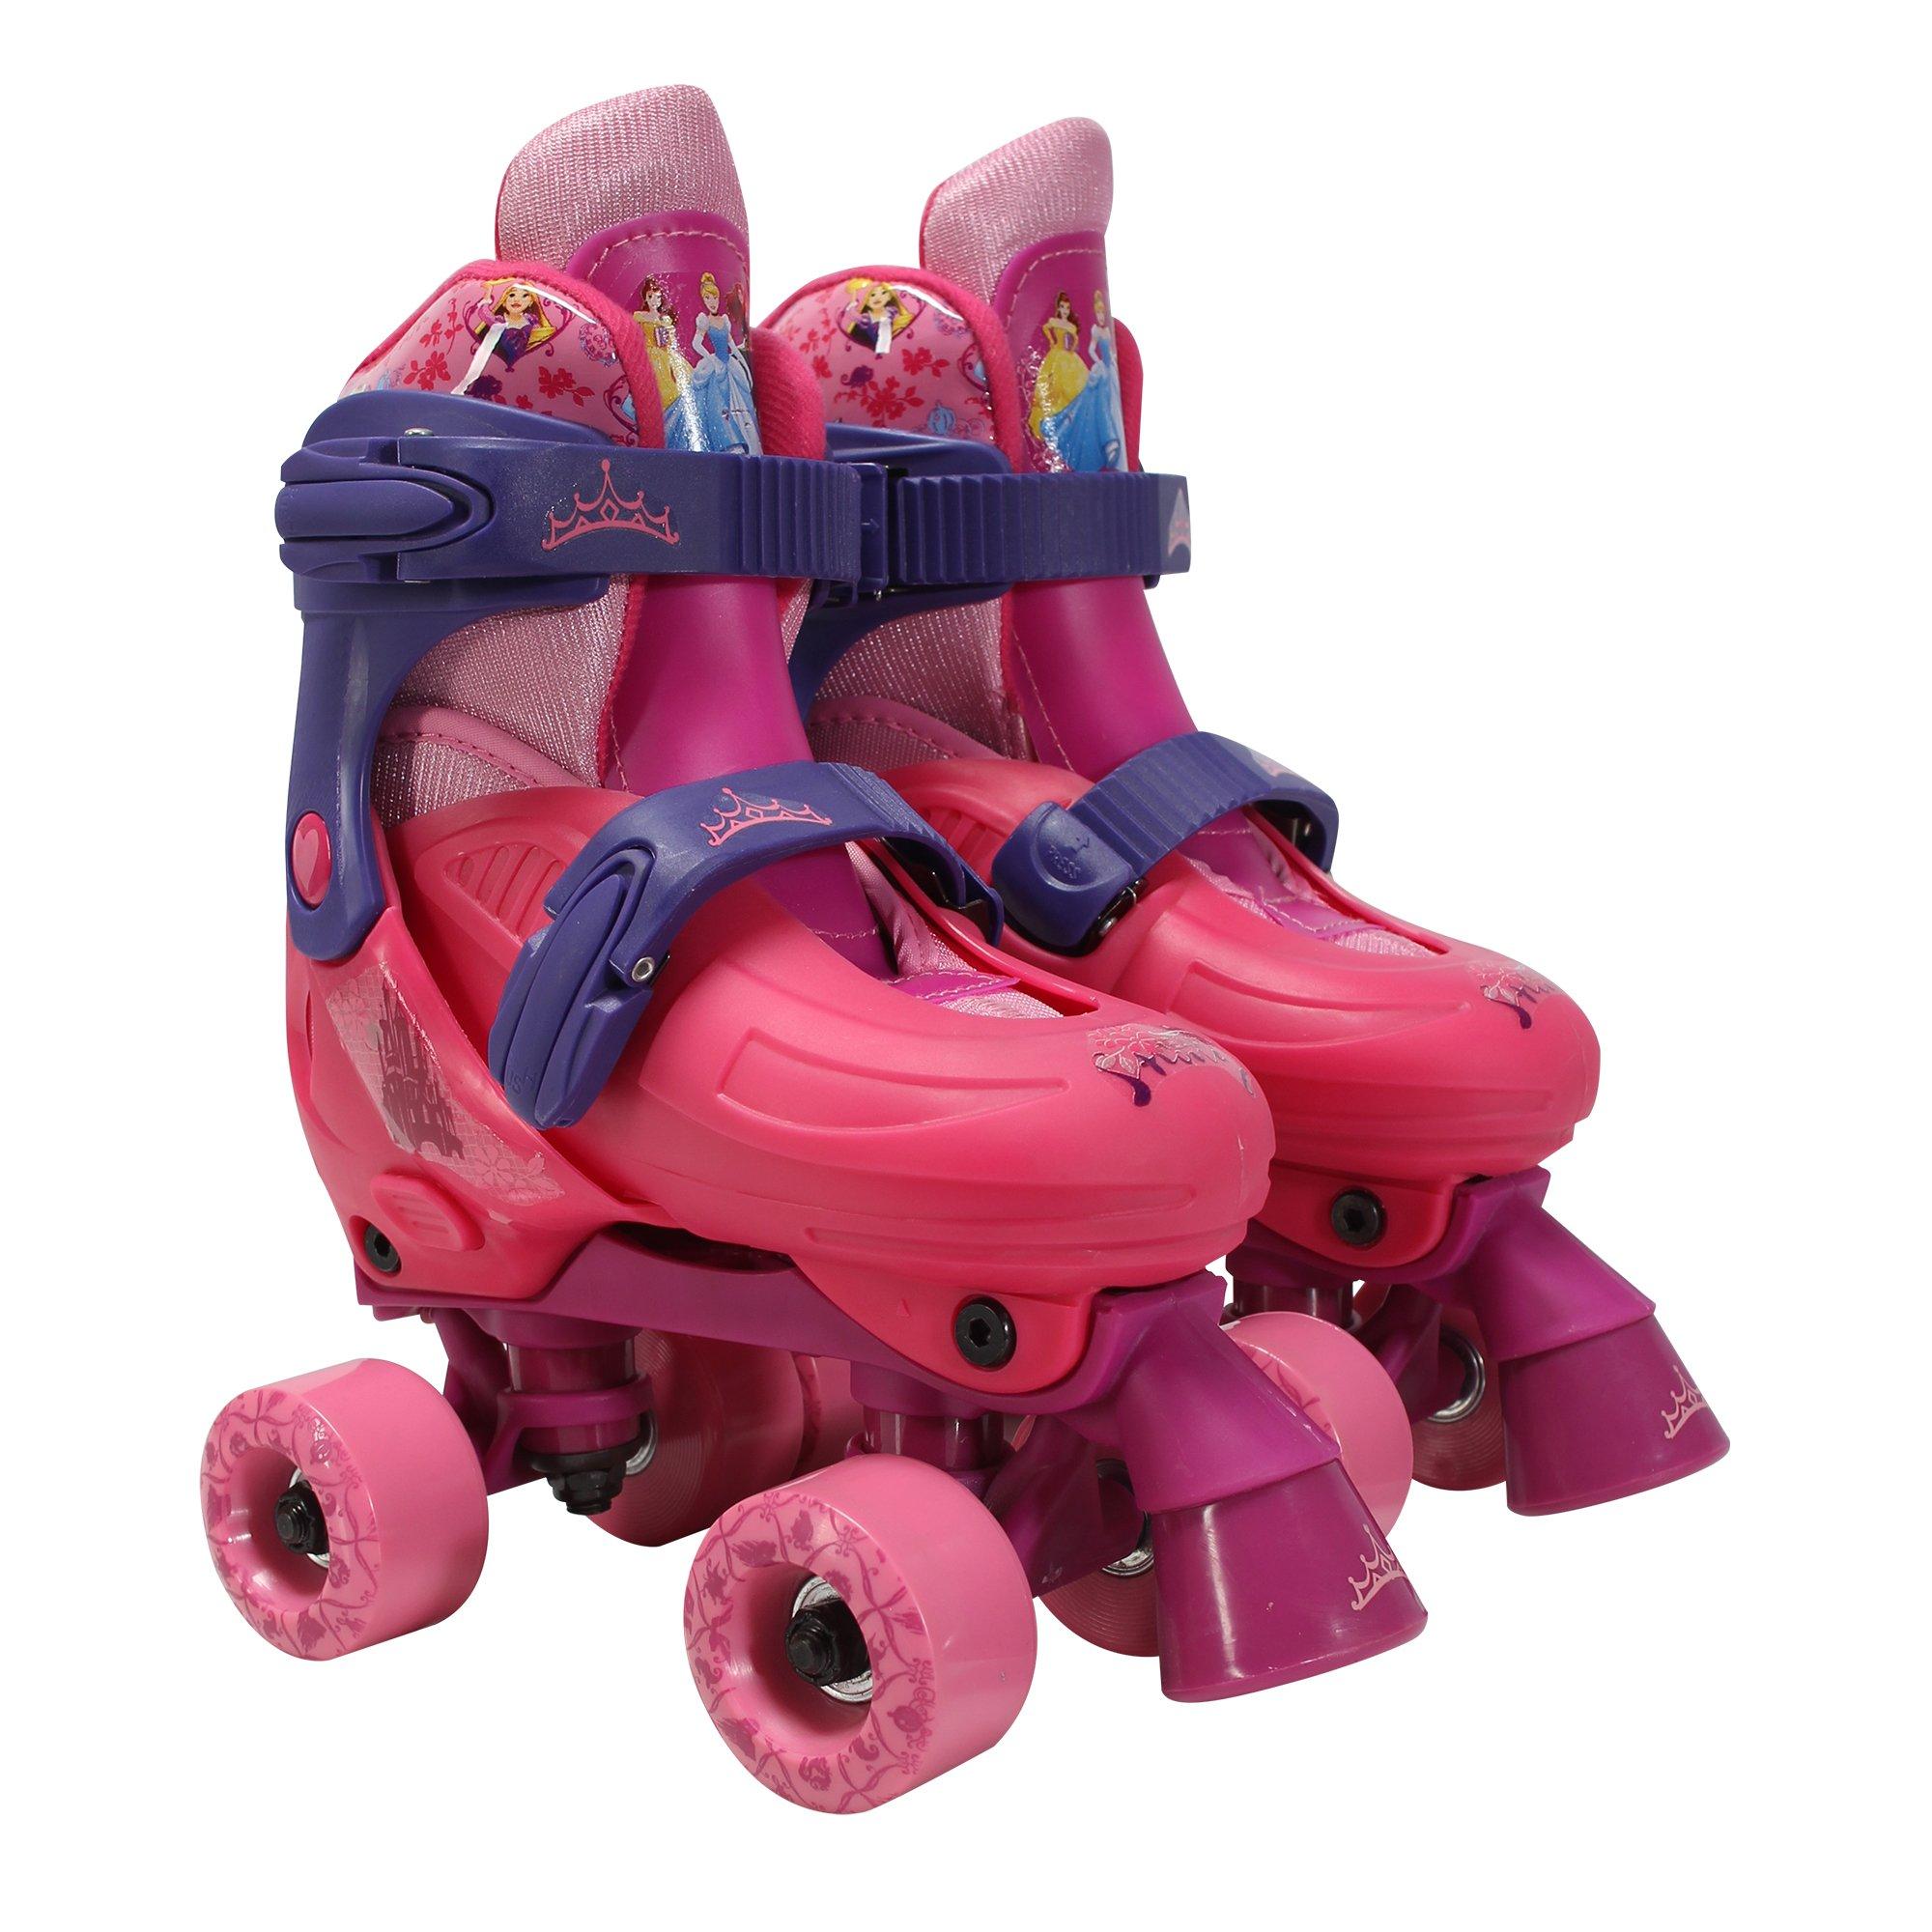 PlayWheels Disney Princess Classic Quad Roller Skates, Junior Size 10-13